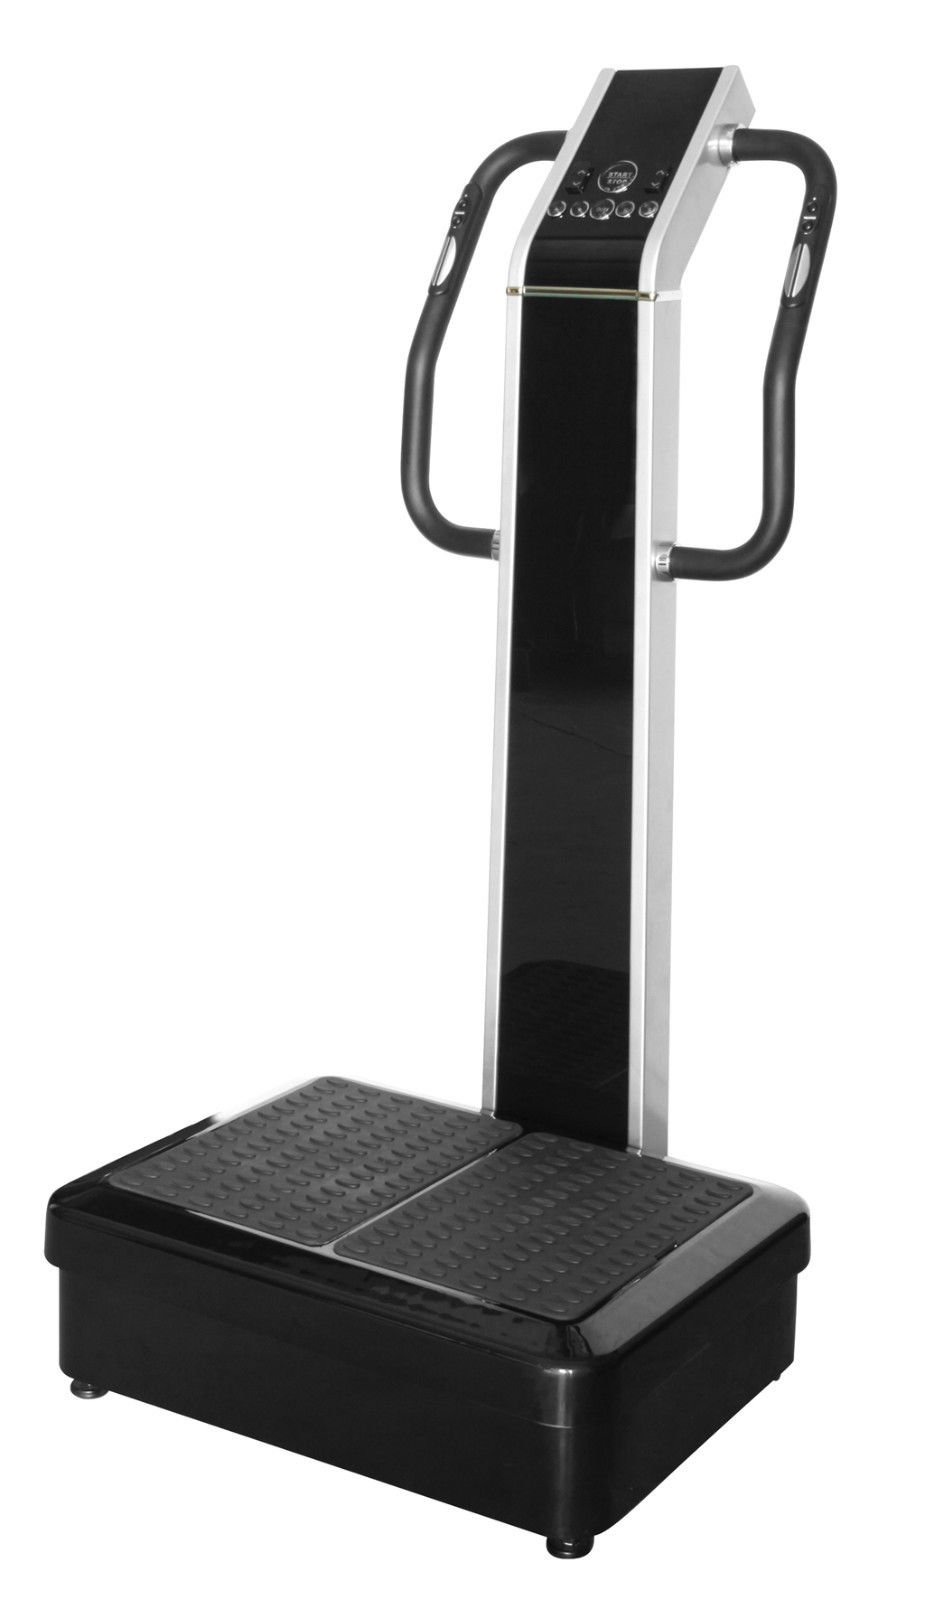 Whole Body Vibration Machine - Dual Motor by SDI : Commercial (2HP, 440 lbs), Dual Motor, Large Vibrating Platform, USB Programmable